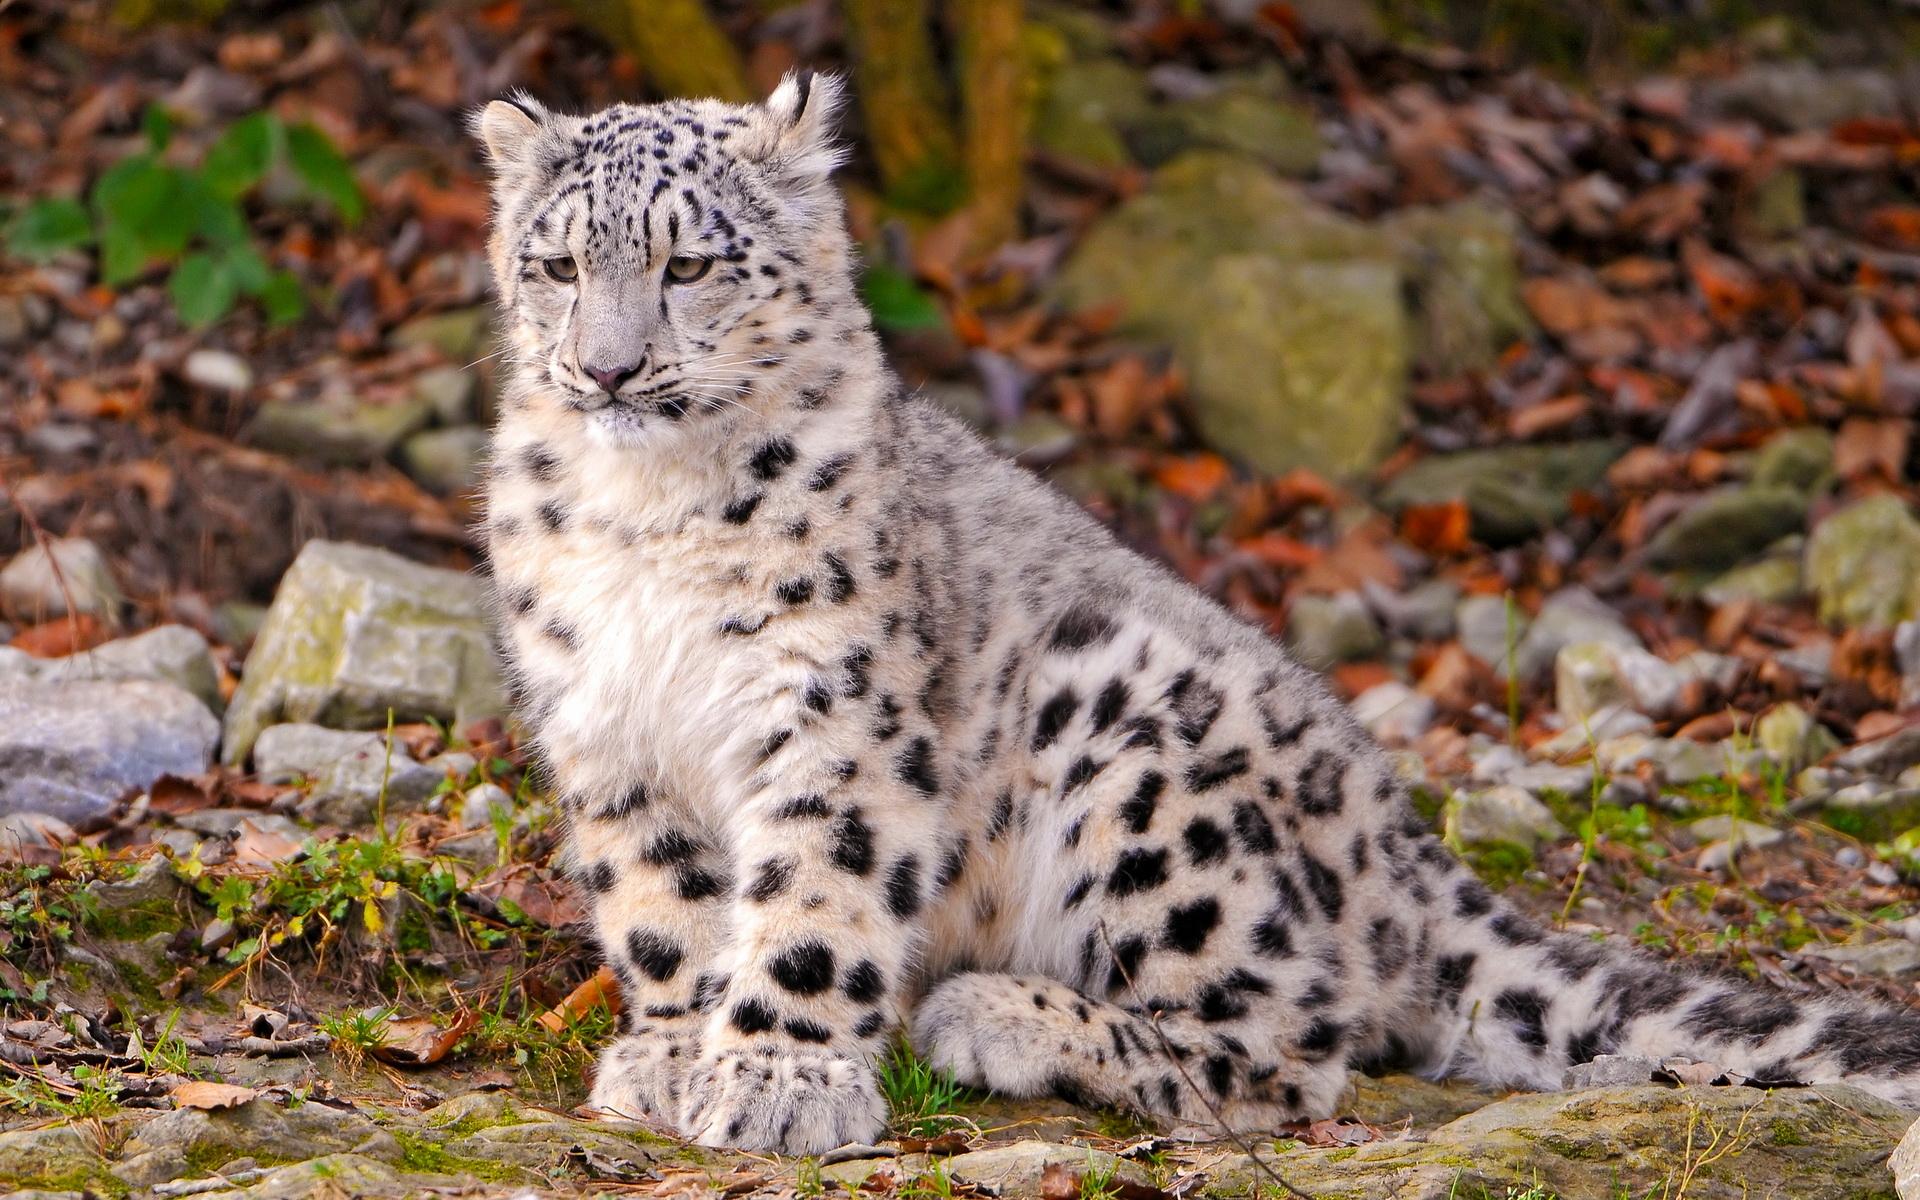 leopard wallpapers 1080p